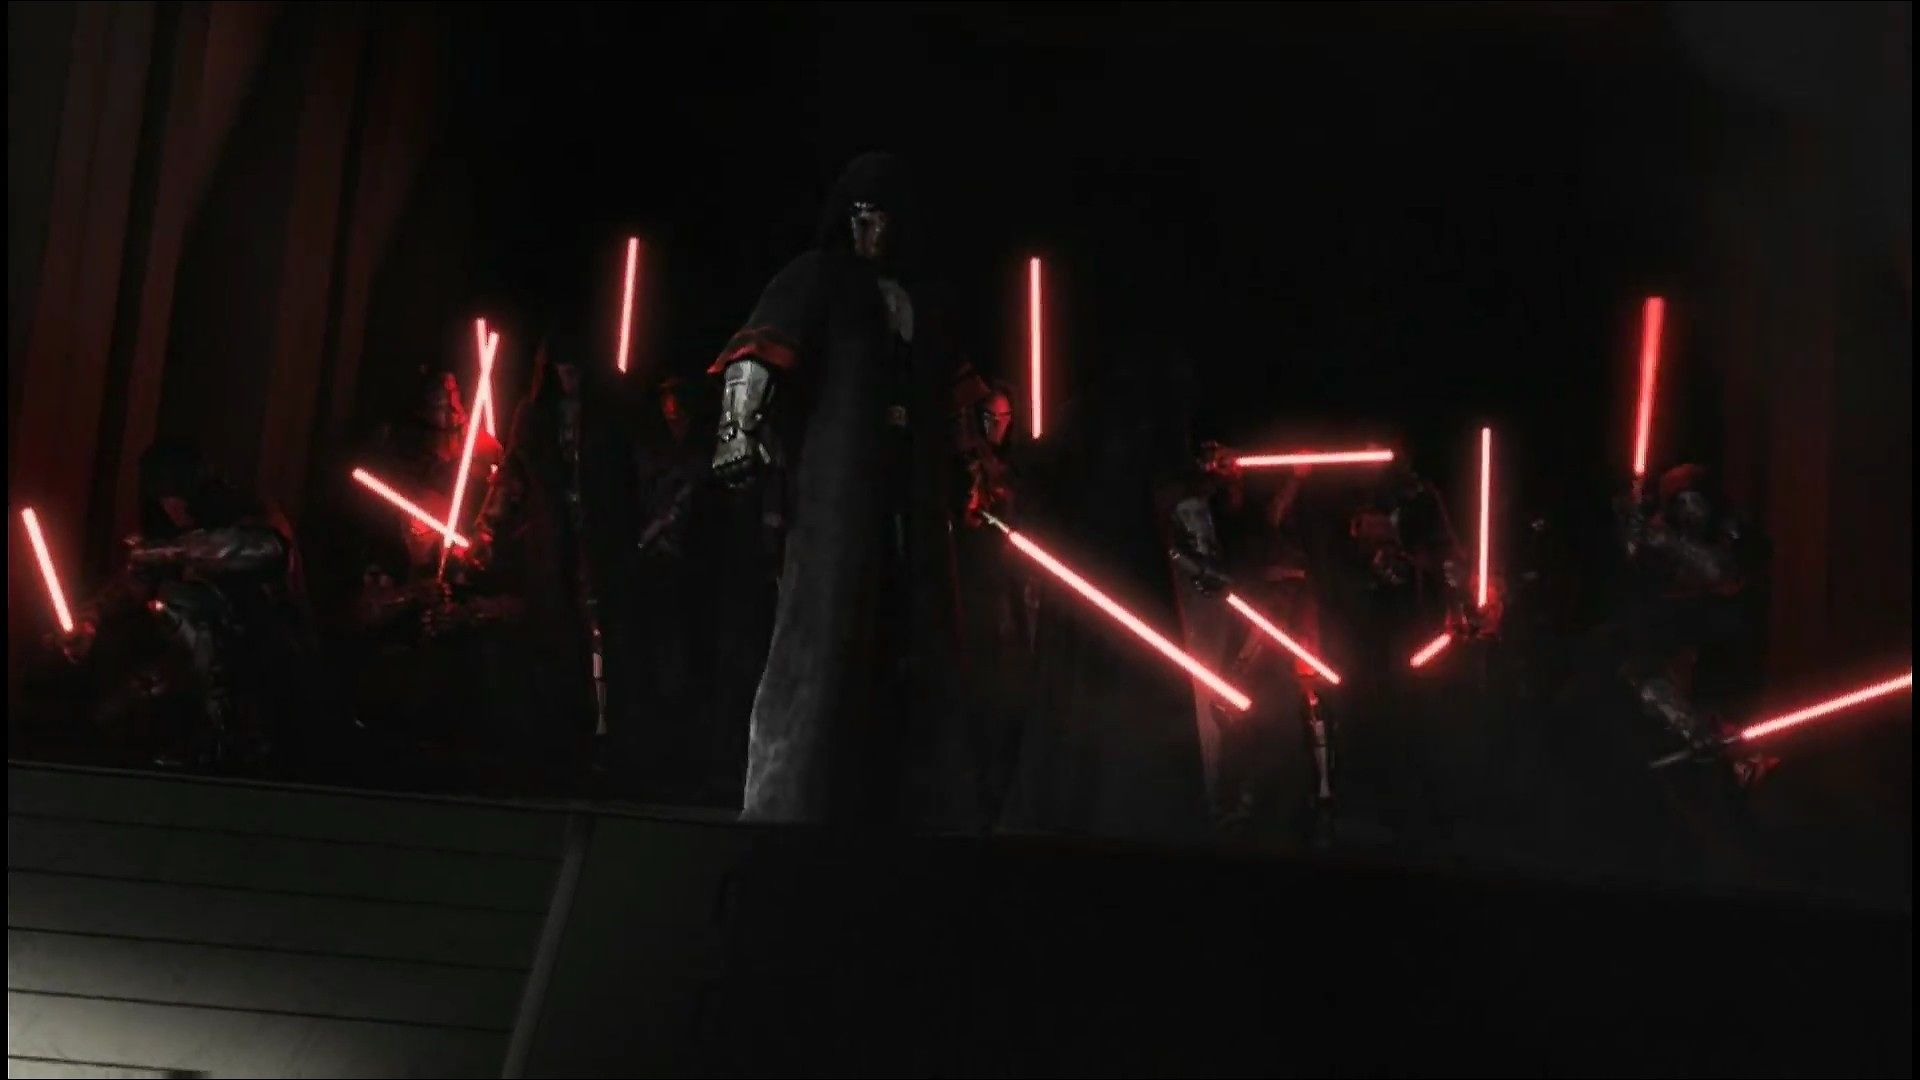 The Villains of Star Wars Episode 7 Their PLAN   moviepilotcom 1920x1080